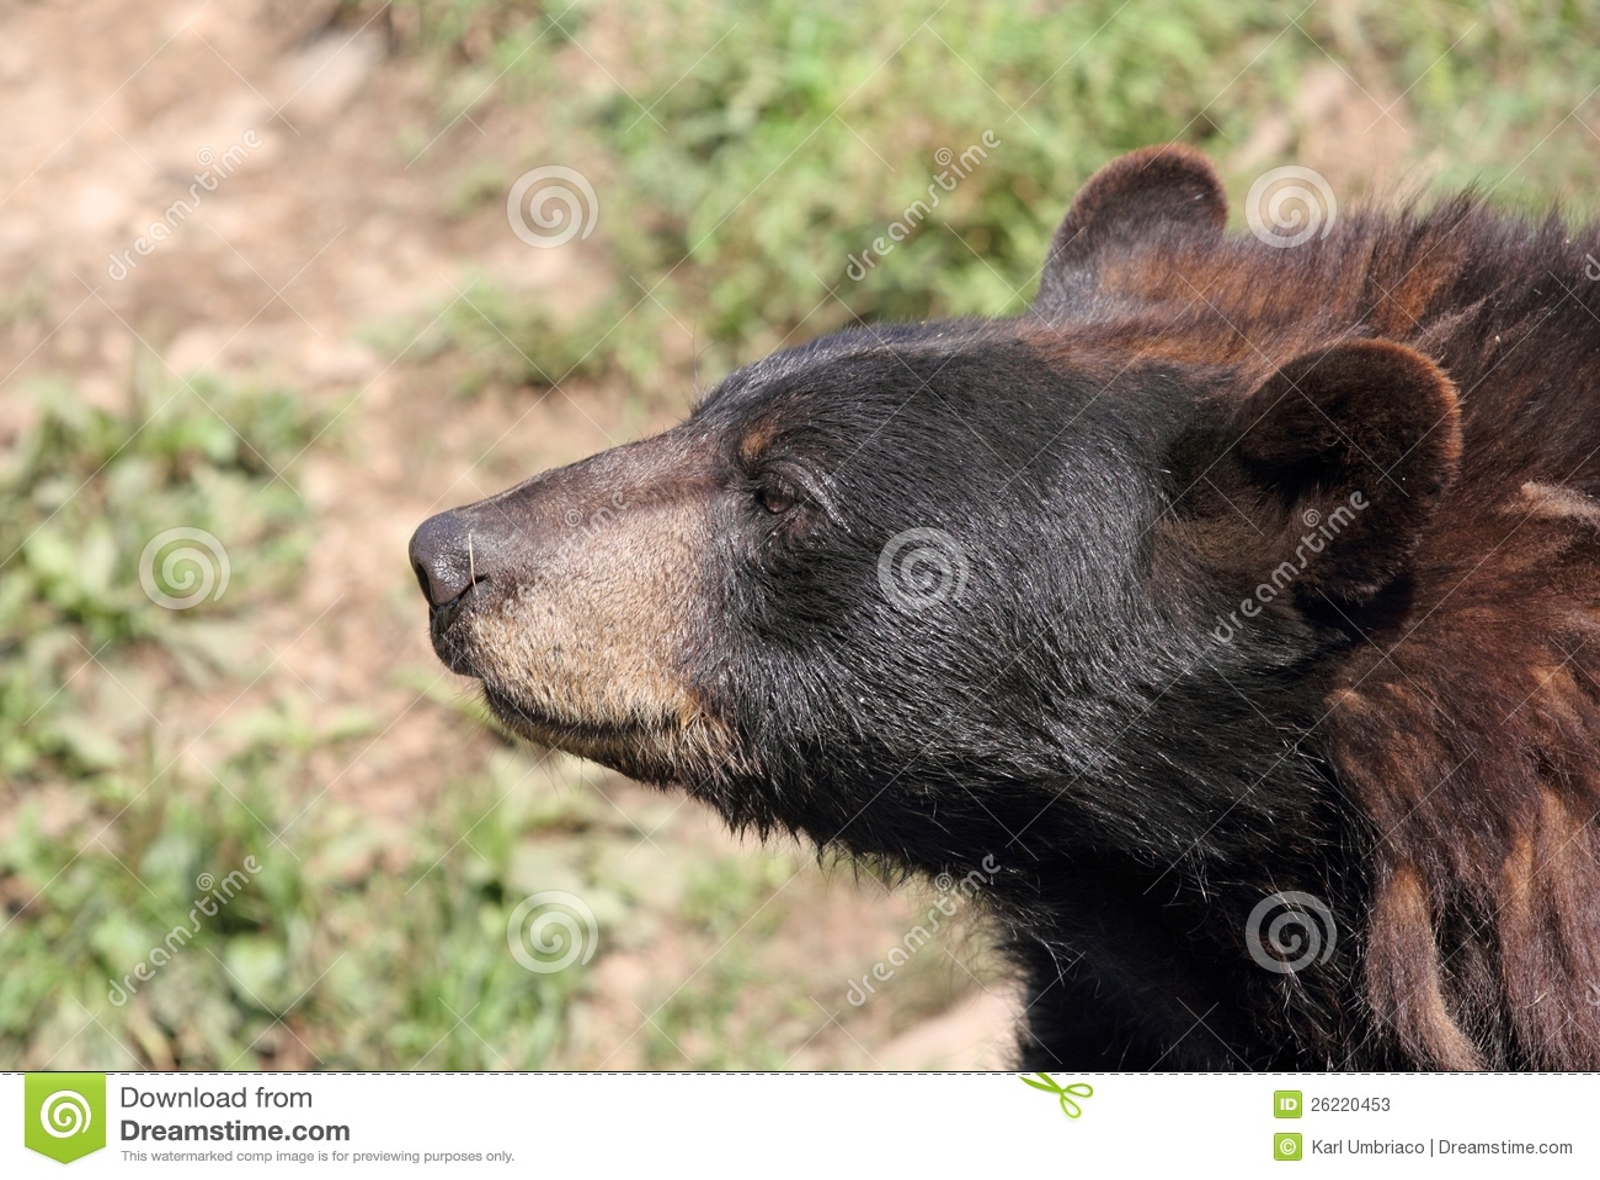 Black bear head profile - photo#18